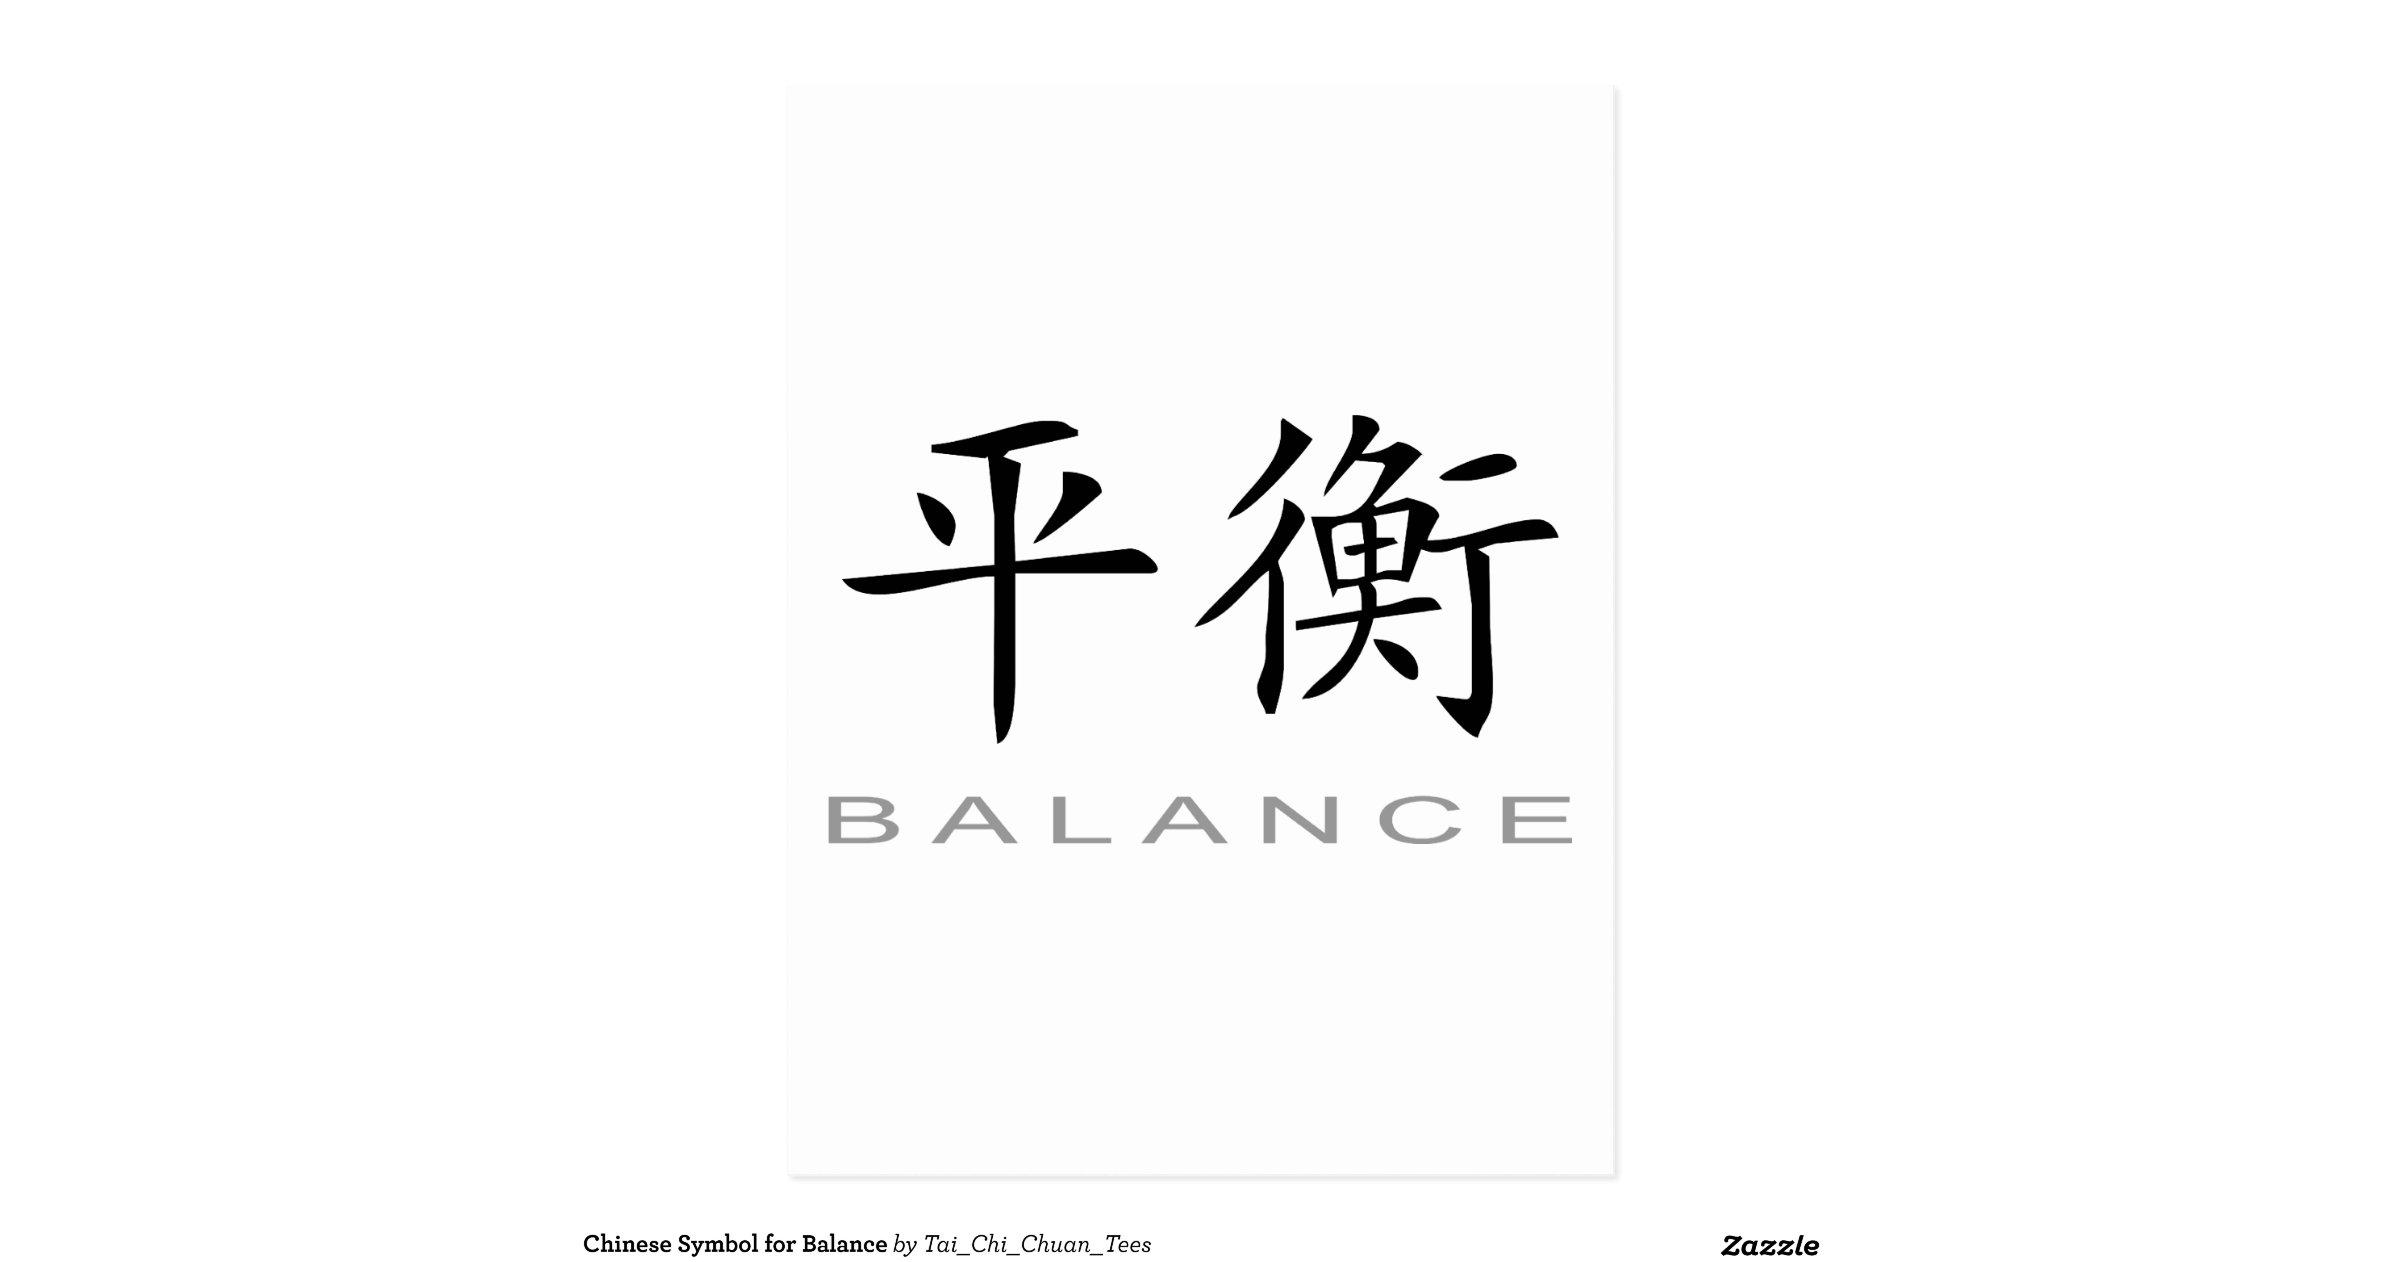 chinesesymbolforbalancepostcard